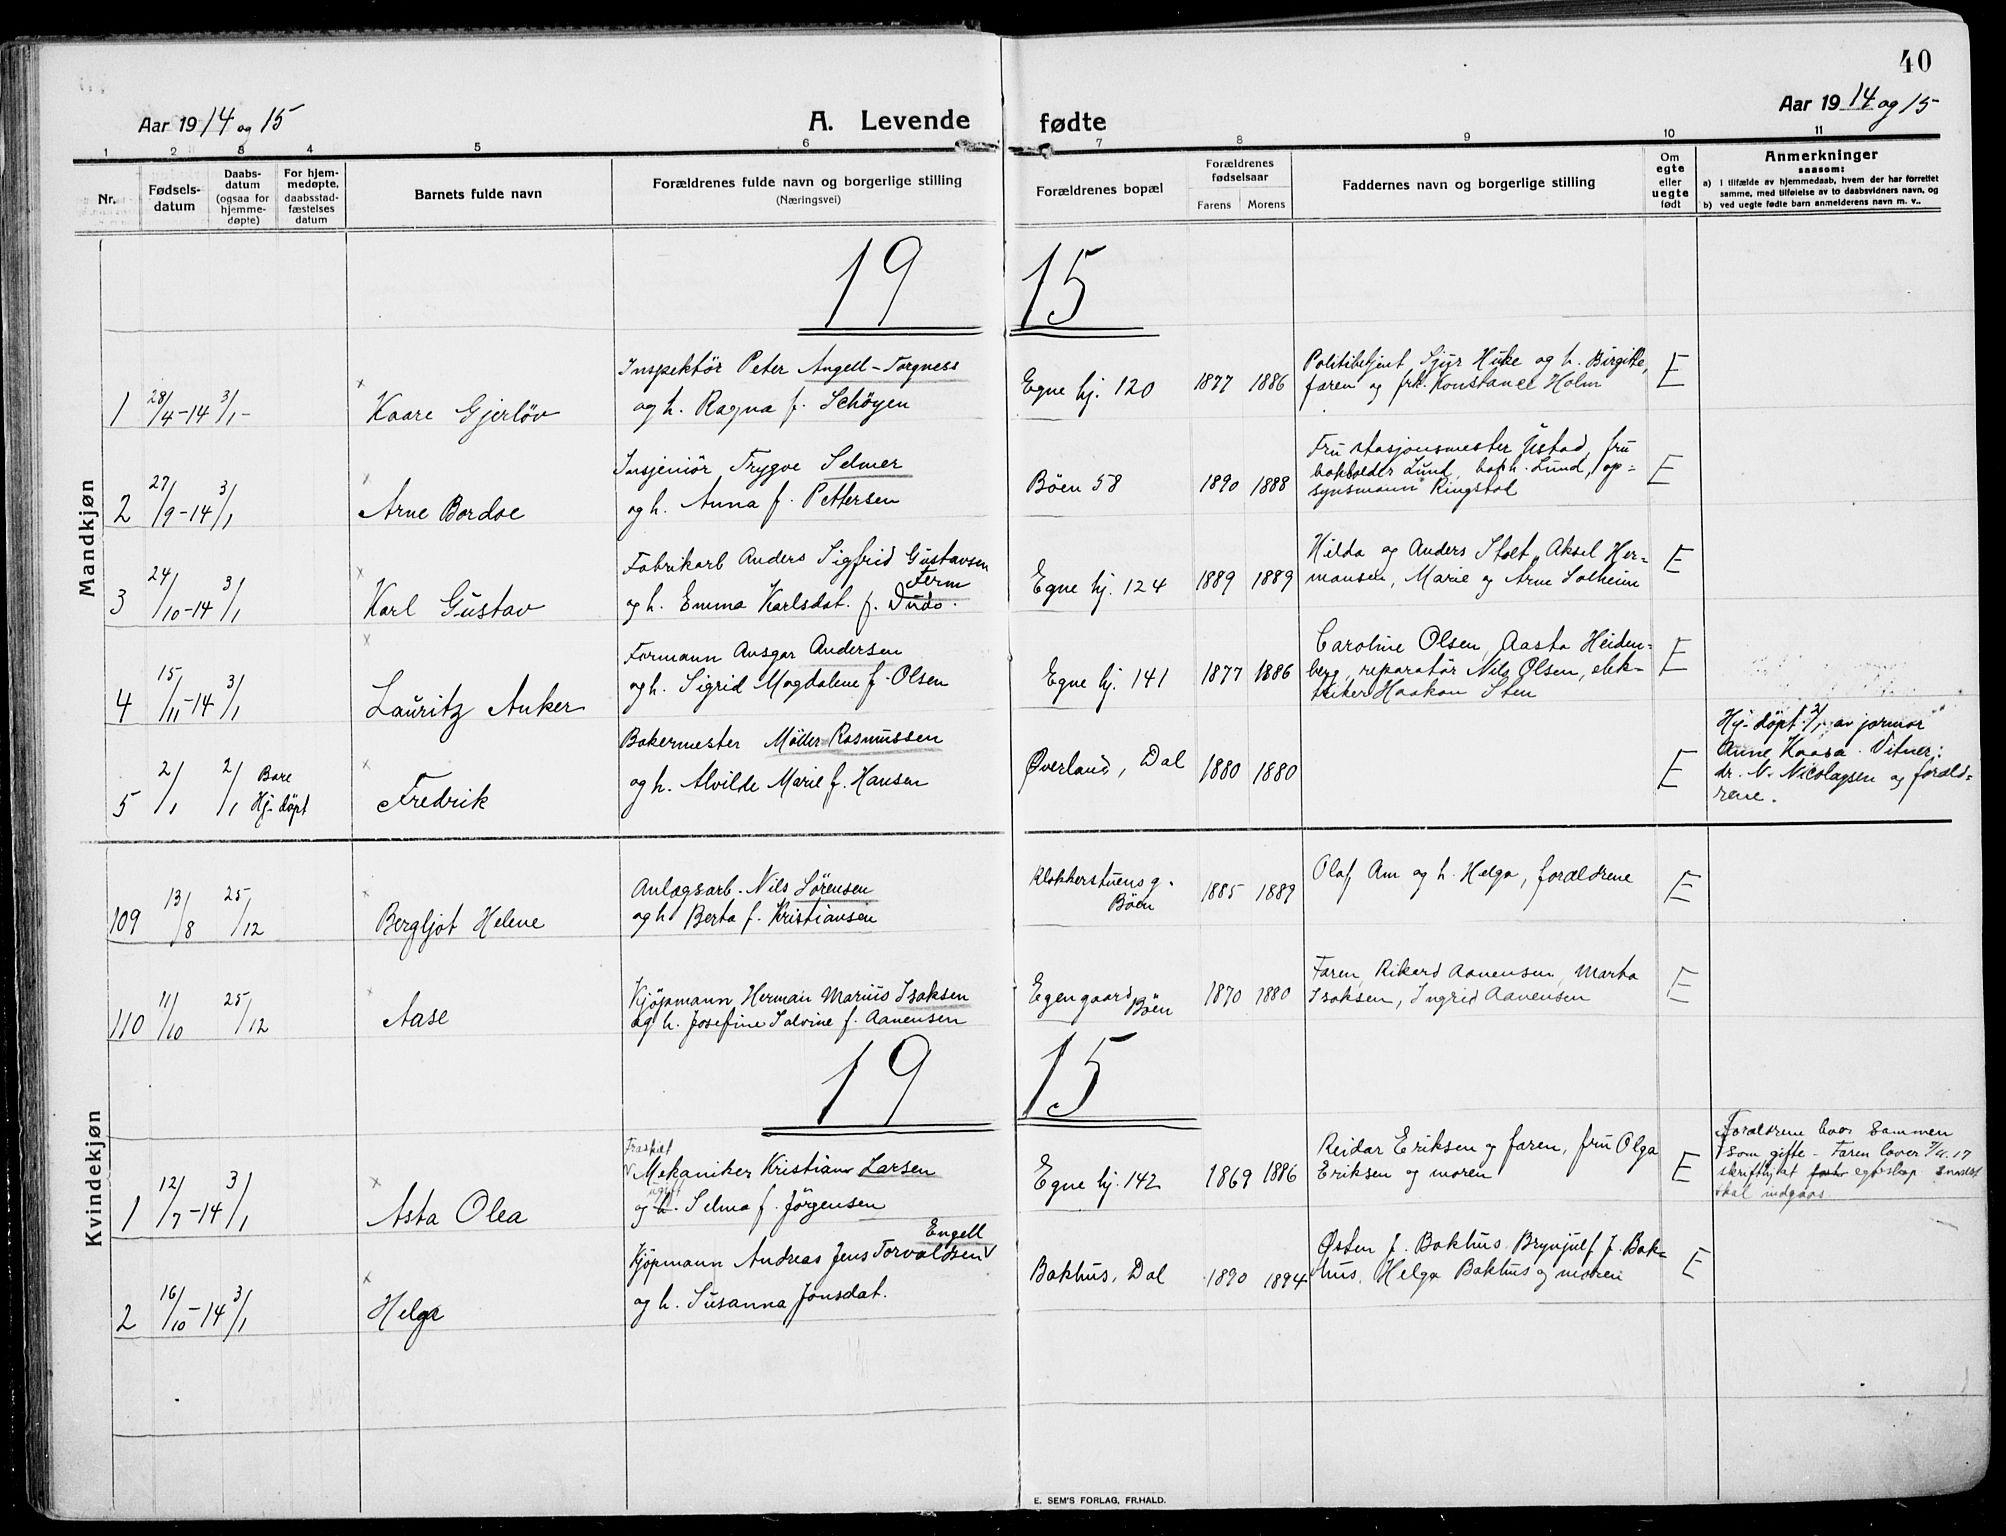 SAKO, Rjukan kirkebøker, F/Fa/L0002: Ministerialbok nr. 2, 1912-1917, s. 40